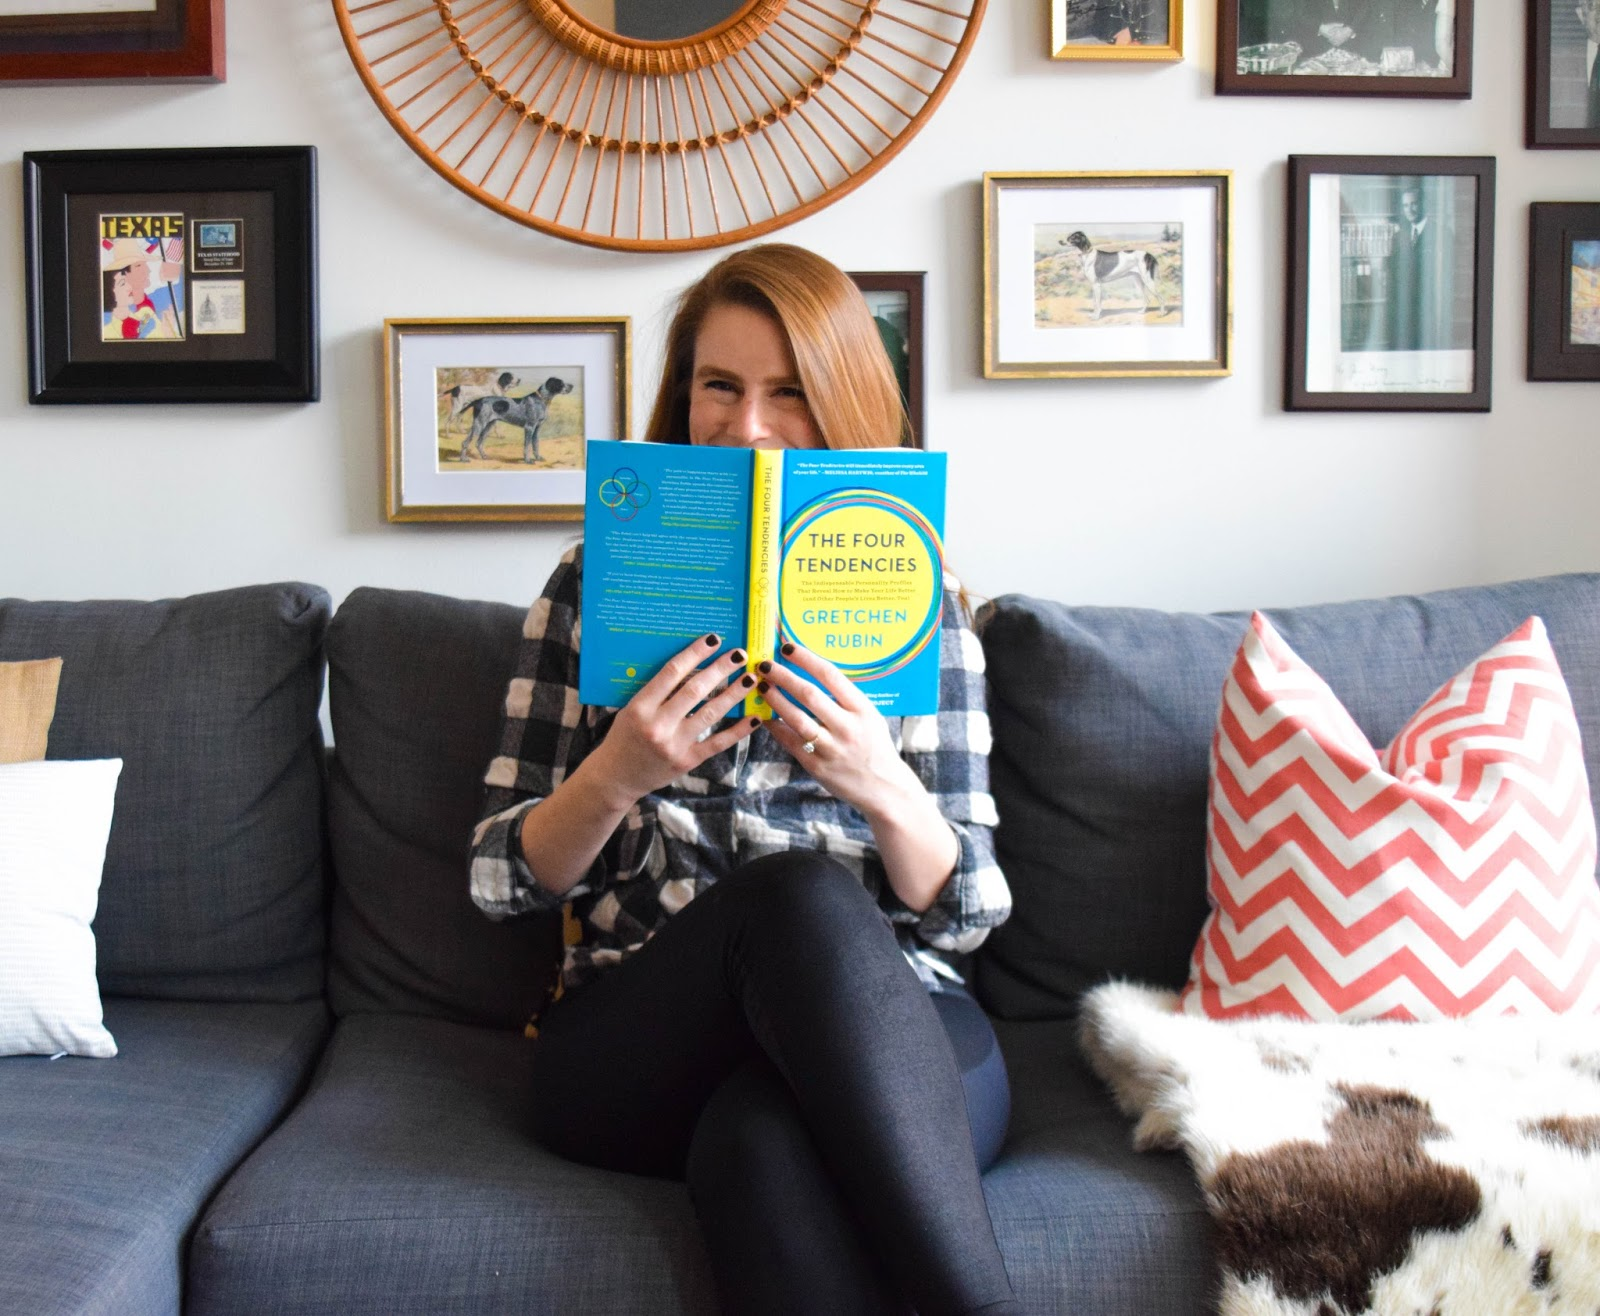 Book Club: Gretchen Rubin's The Four Tendencies